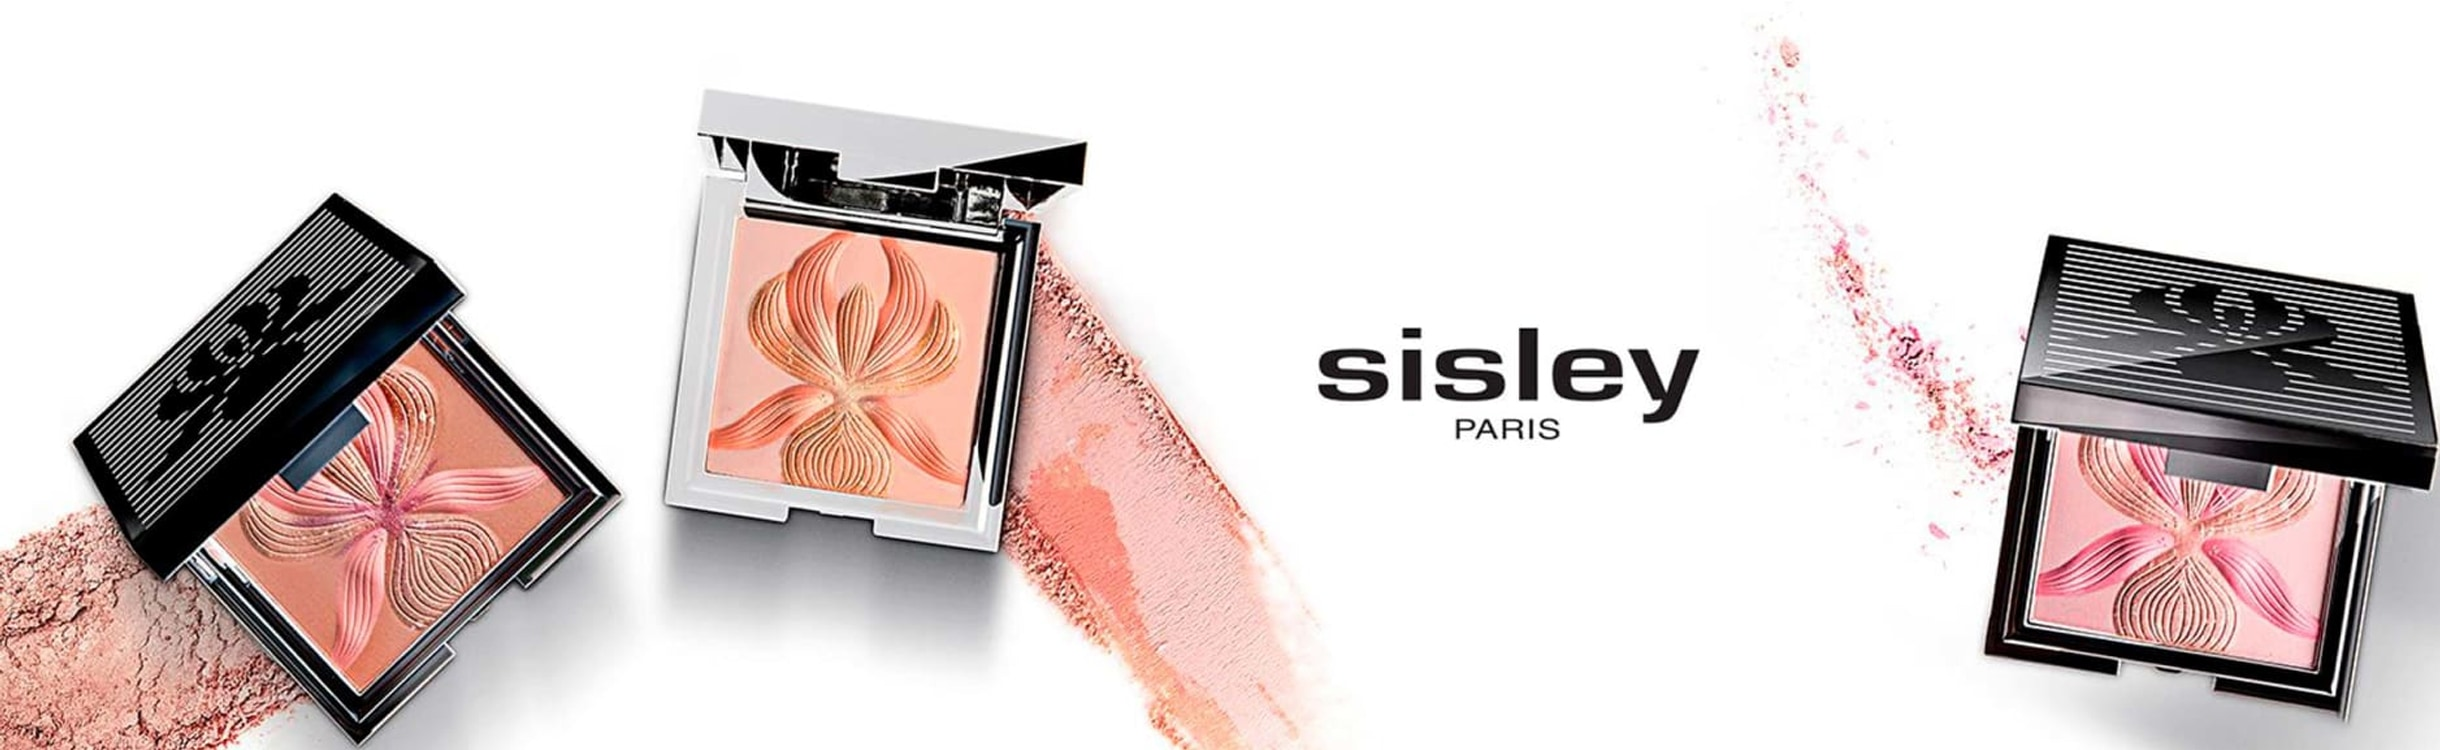 Sisley Cuidados para os Lábios